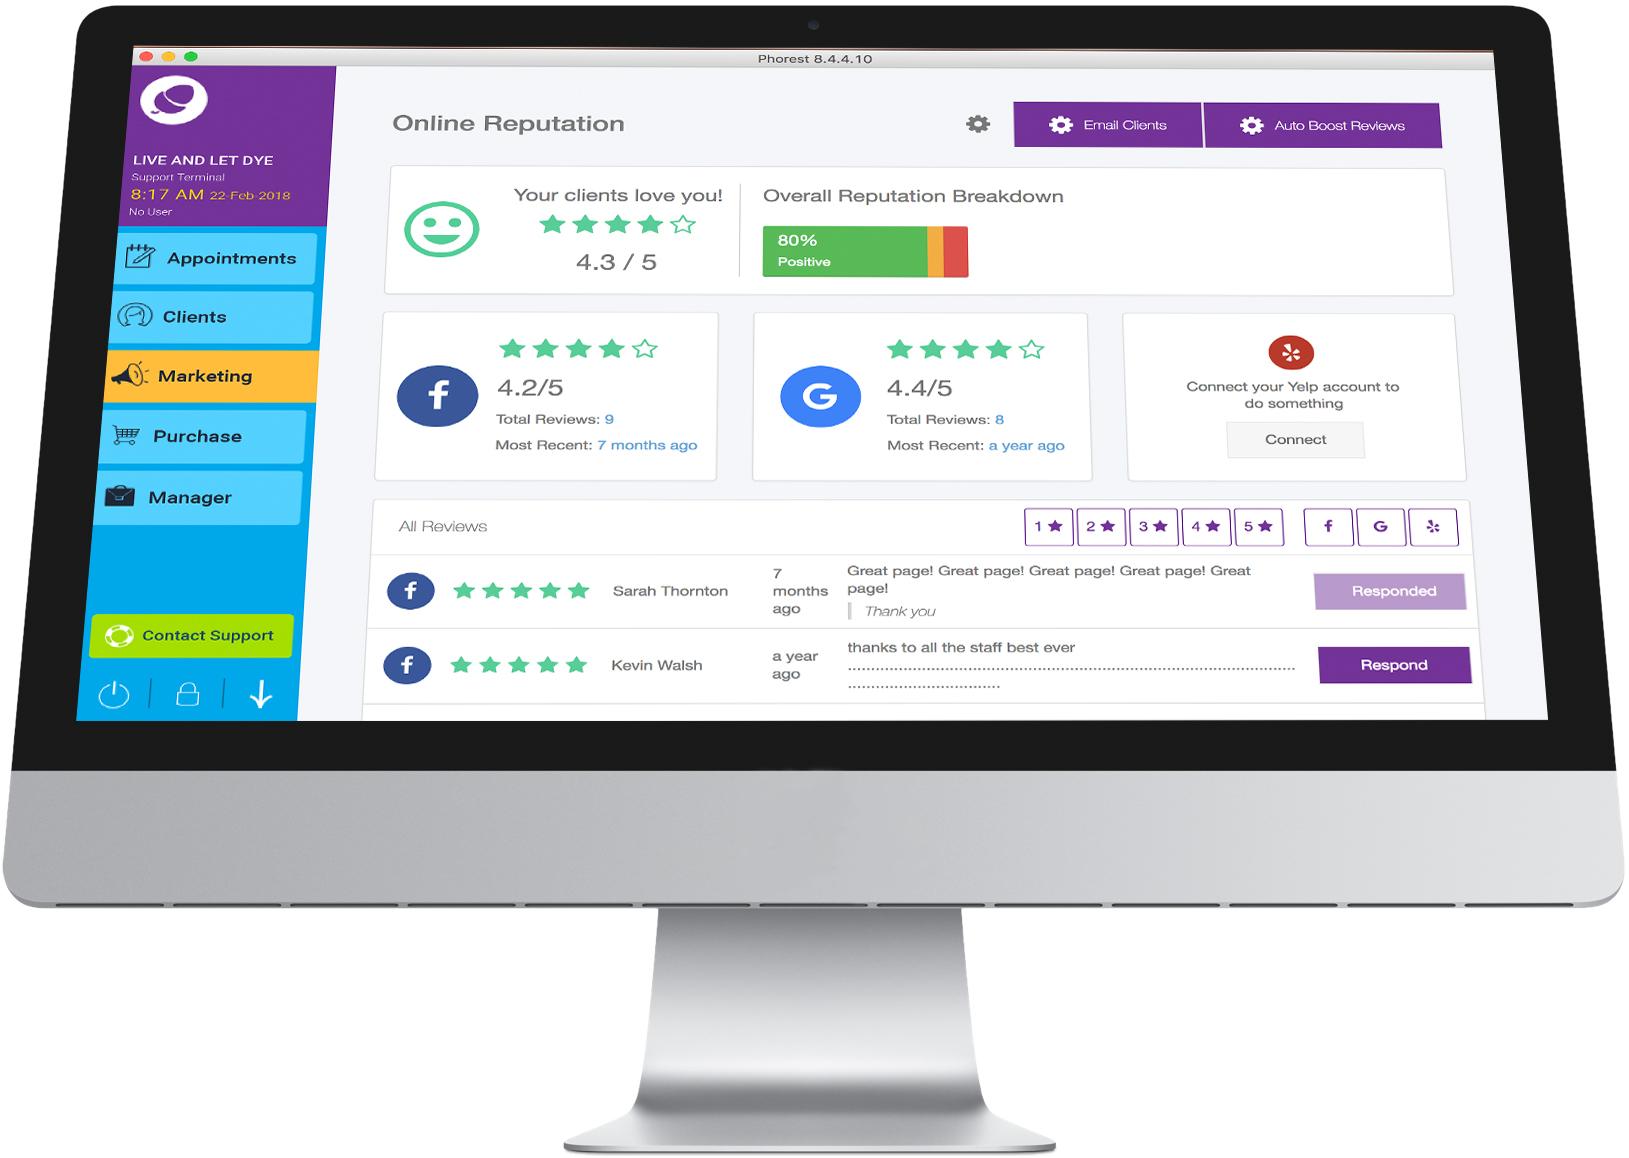 Phorest Salon Software Demo - Phorest Salon Online Reputation Feature